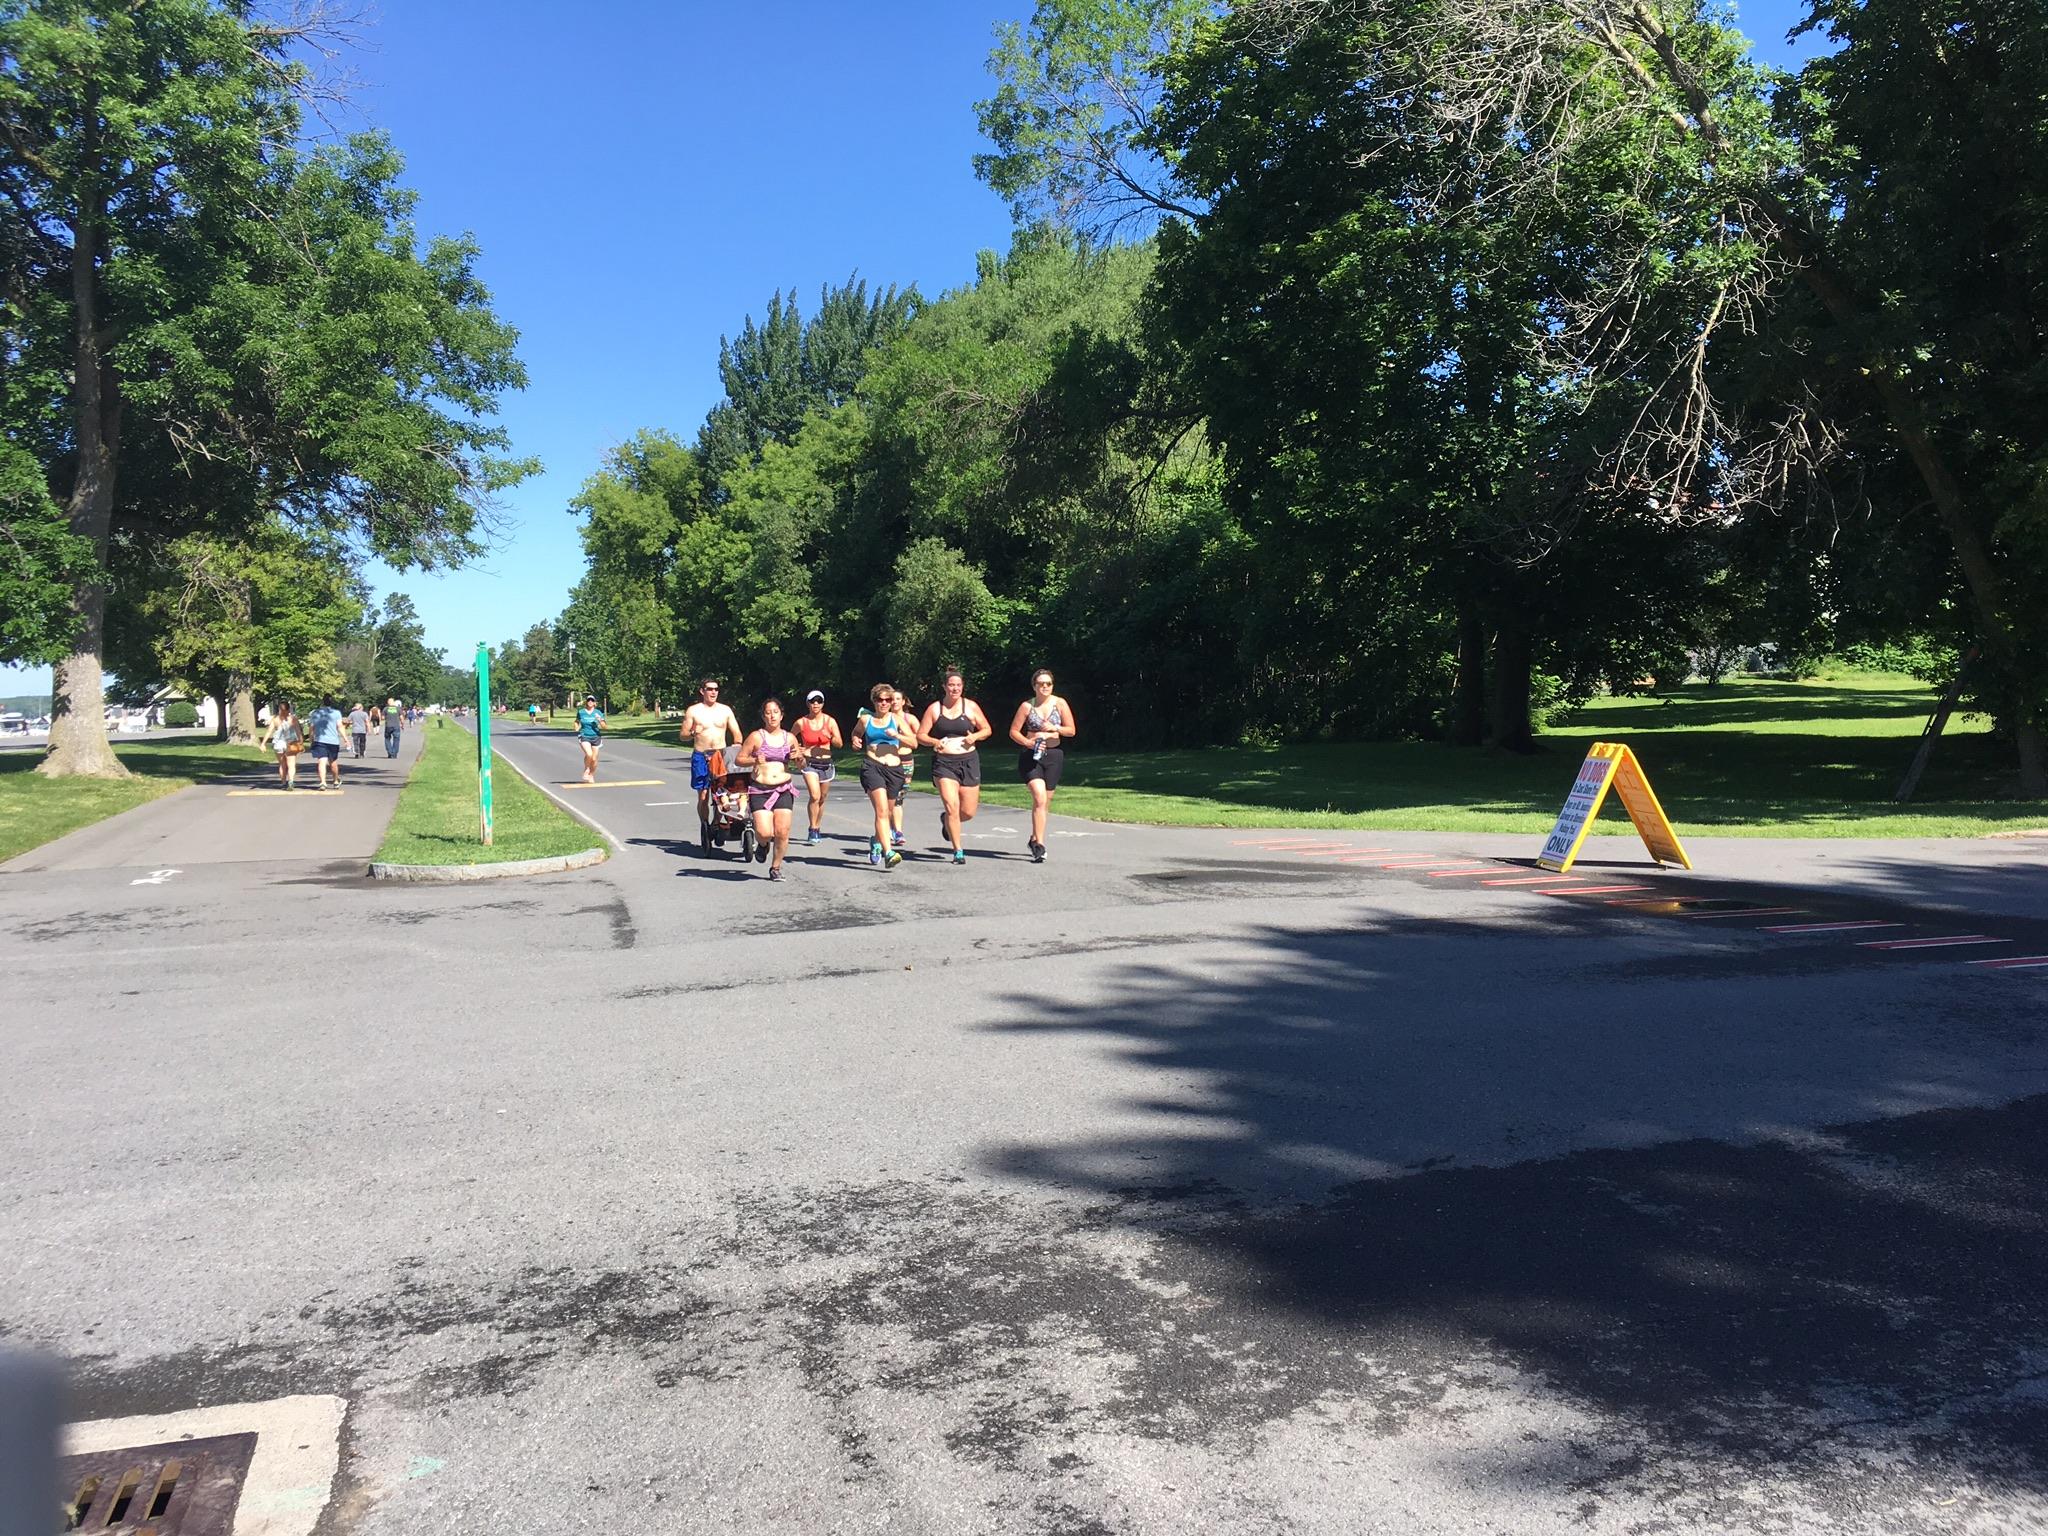 2017 Global Sports Bra Squad Run at Onondaga Lake Park, Syracuse, NY.